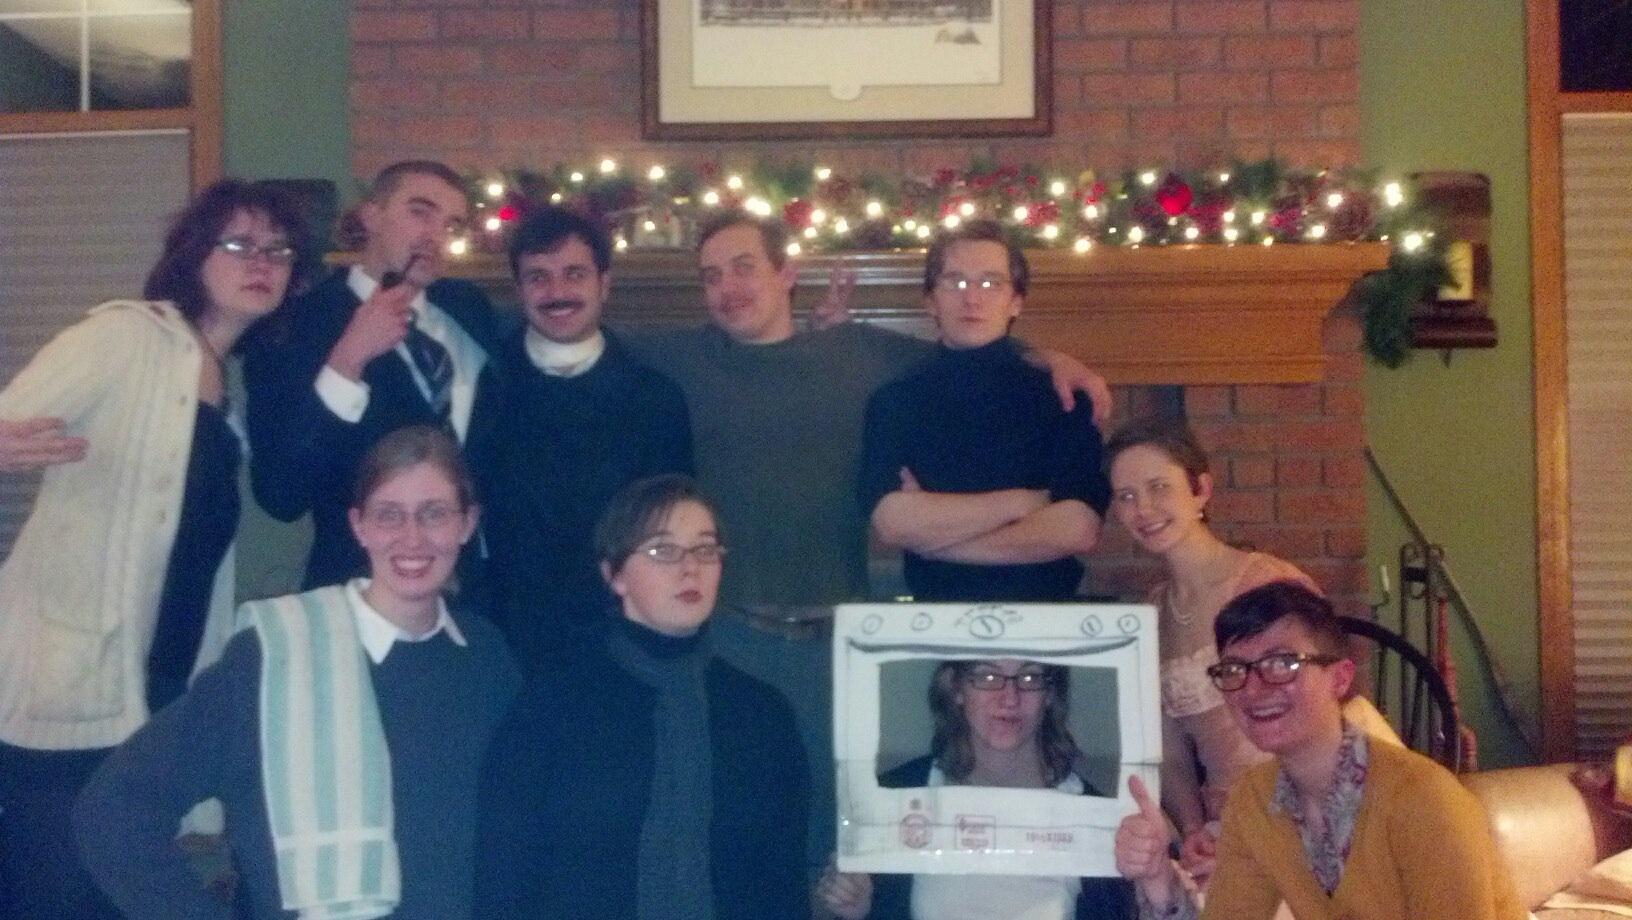 Authors (left to right, back to front) Zelda Fitzgerald, J.R.R. Tolkien, Edgar Allan Poe, John Steinbeck, Carl Sagan, Douglas Adams, Ayn Rand, Sylvia Plath, Margaret Mitchell